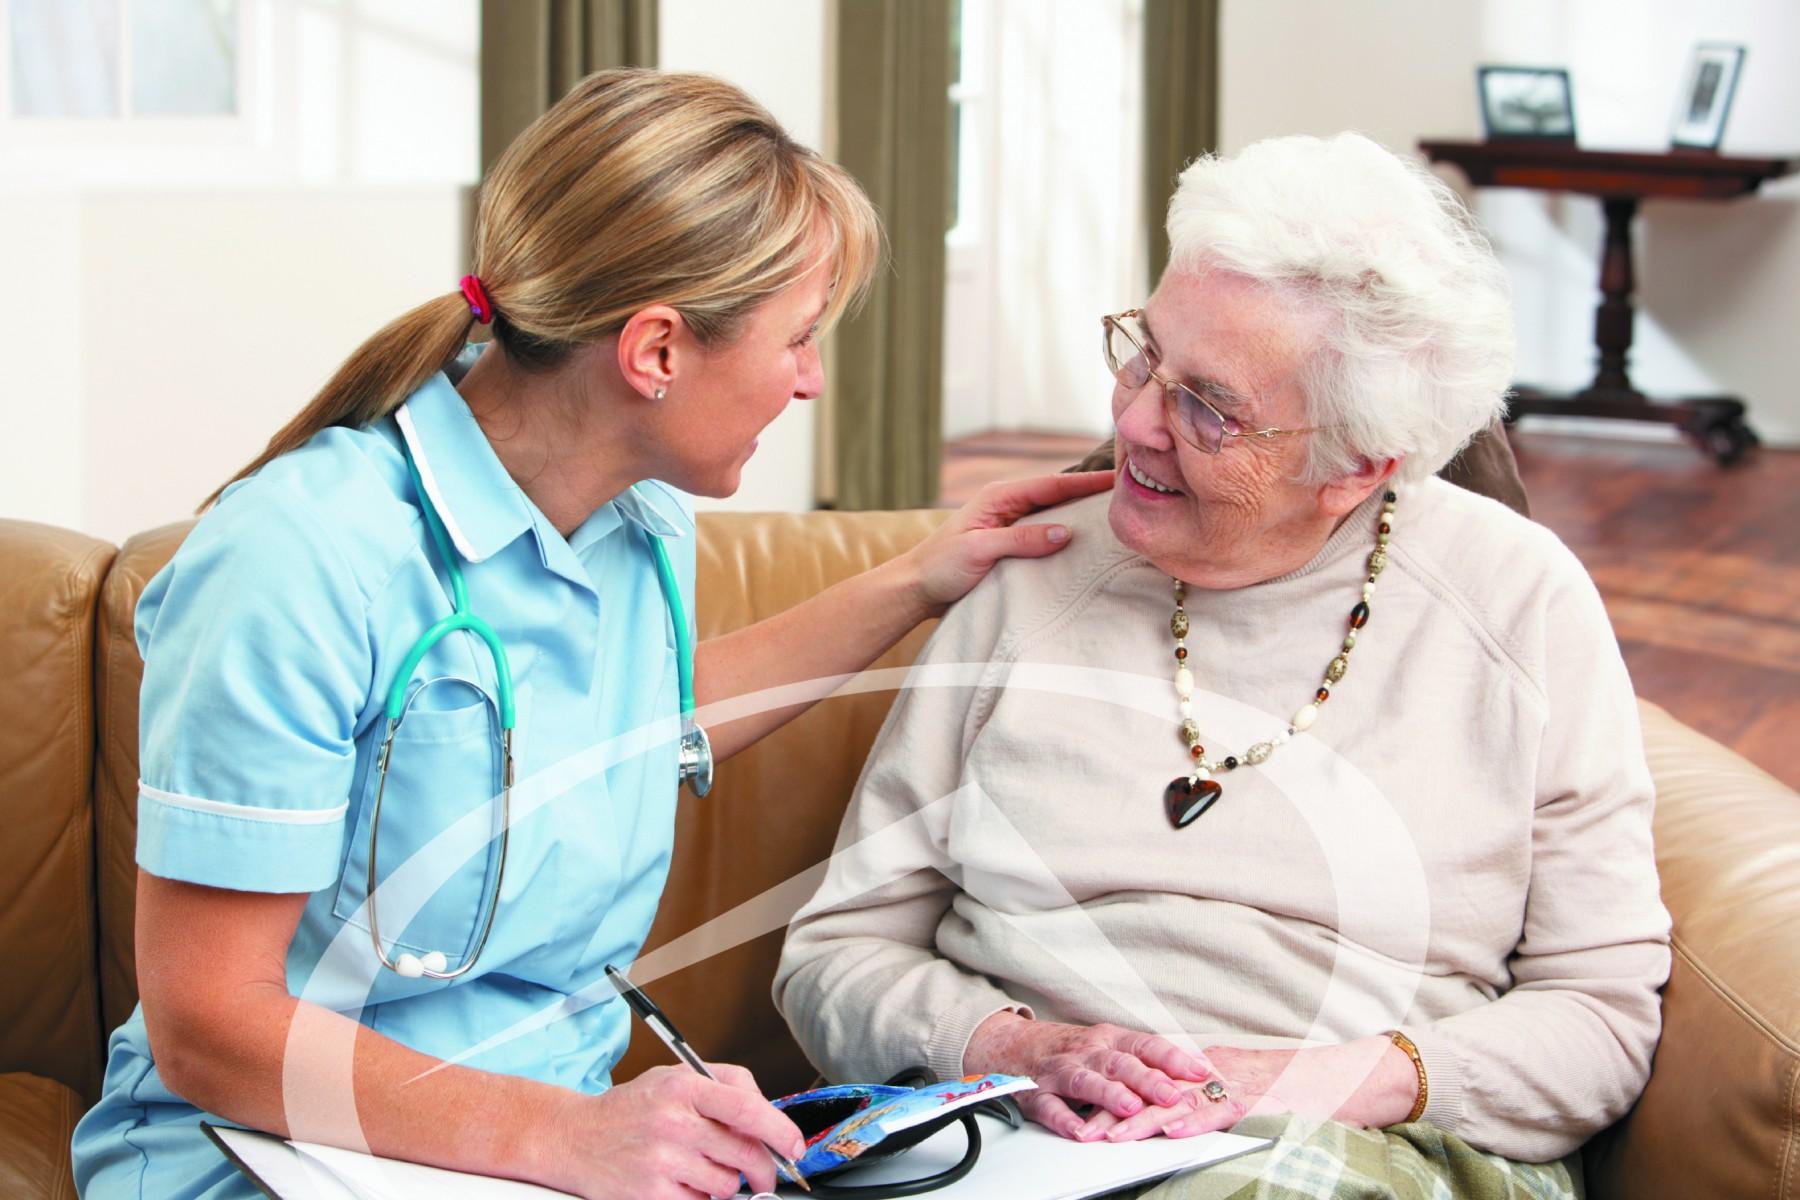 ati home health receives the shpbest health patient satisfaction award rh news atipt com